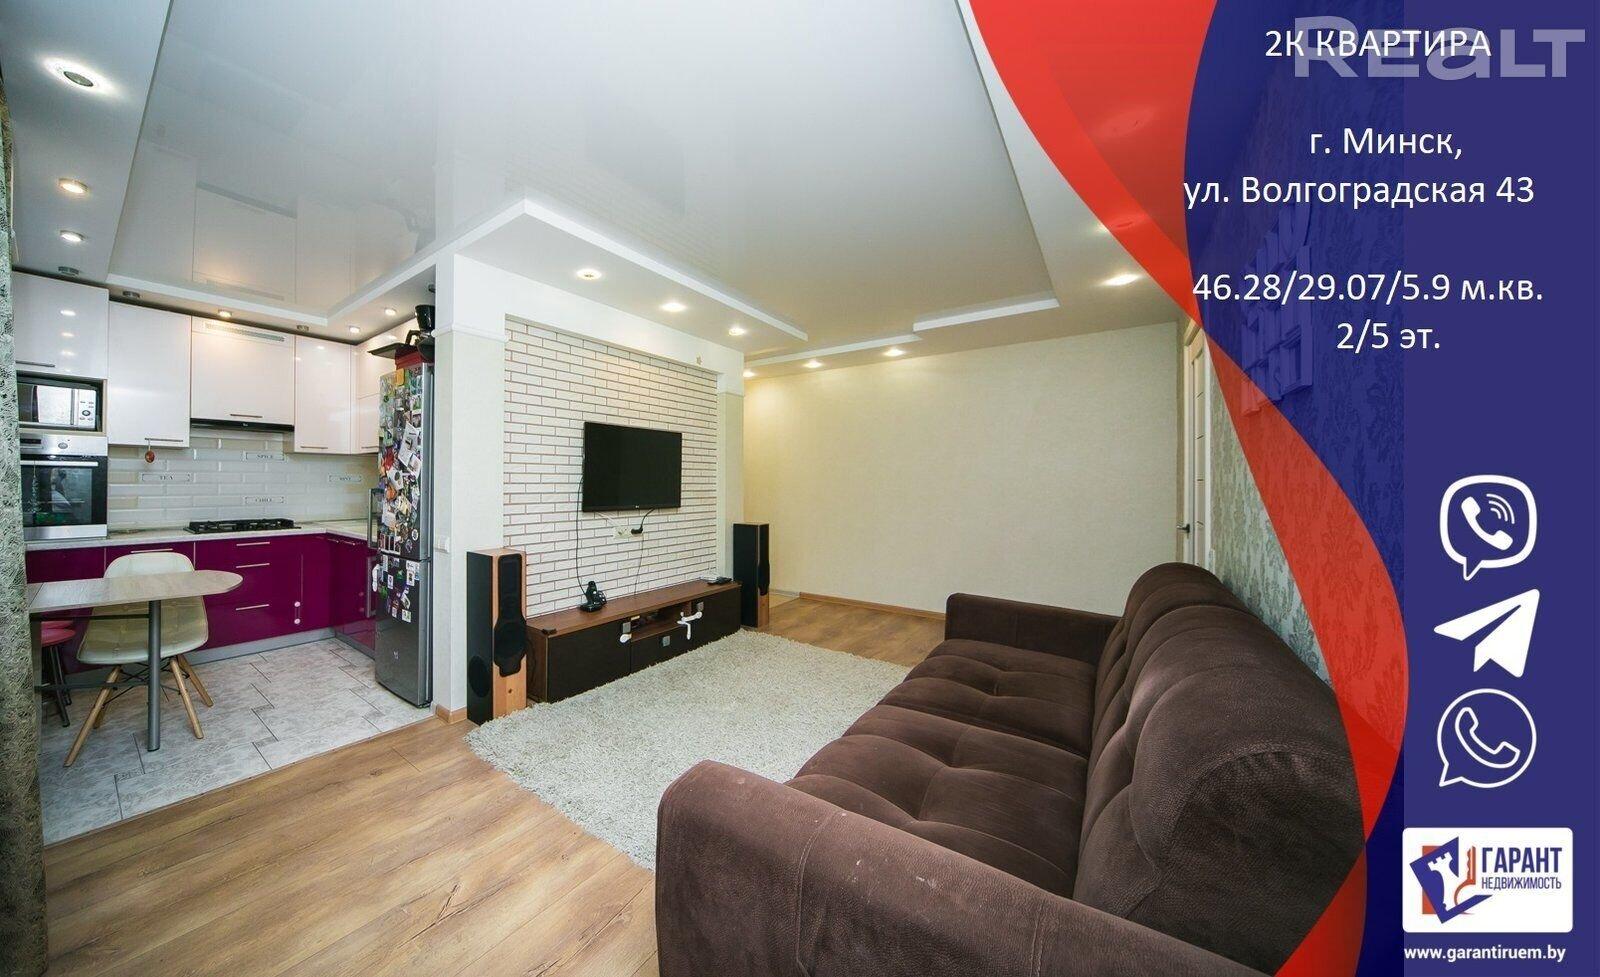 2-комнатная квартира по ул. Волгоградская 43, ст.м. Парк Челюскинцев